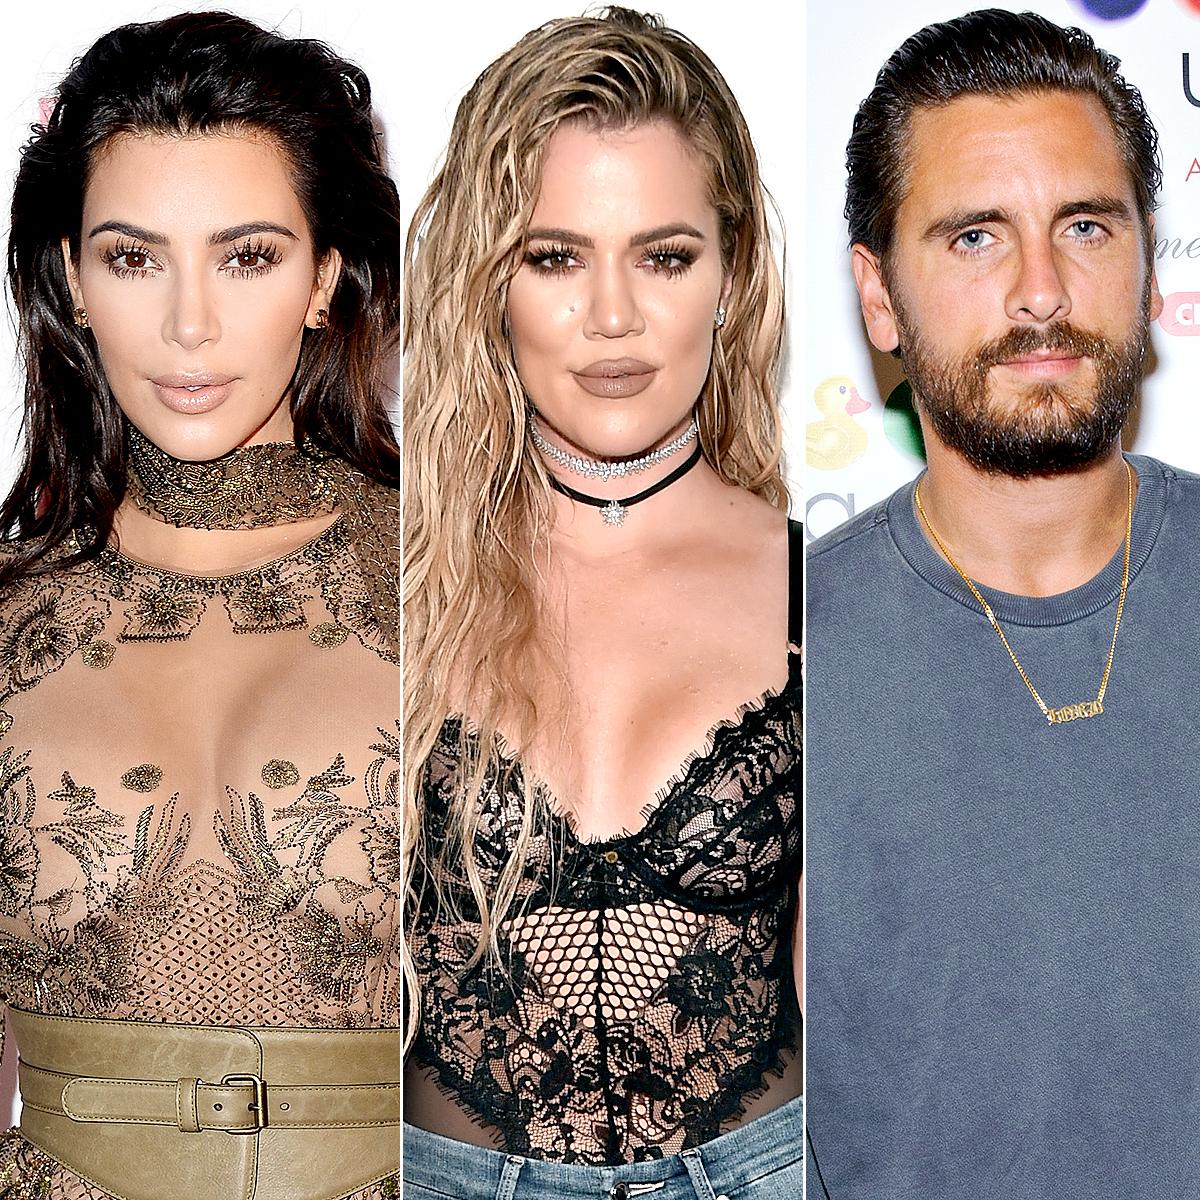 Kim Kardashian, Khloe Kardashian, and Scott Disick